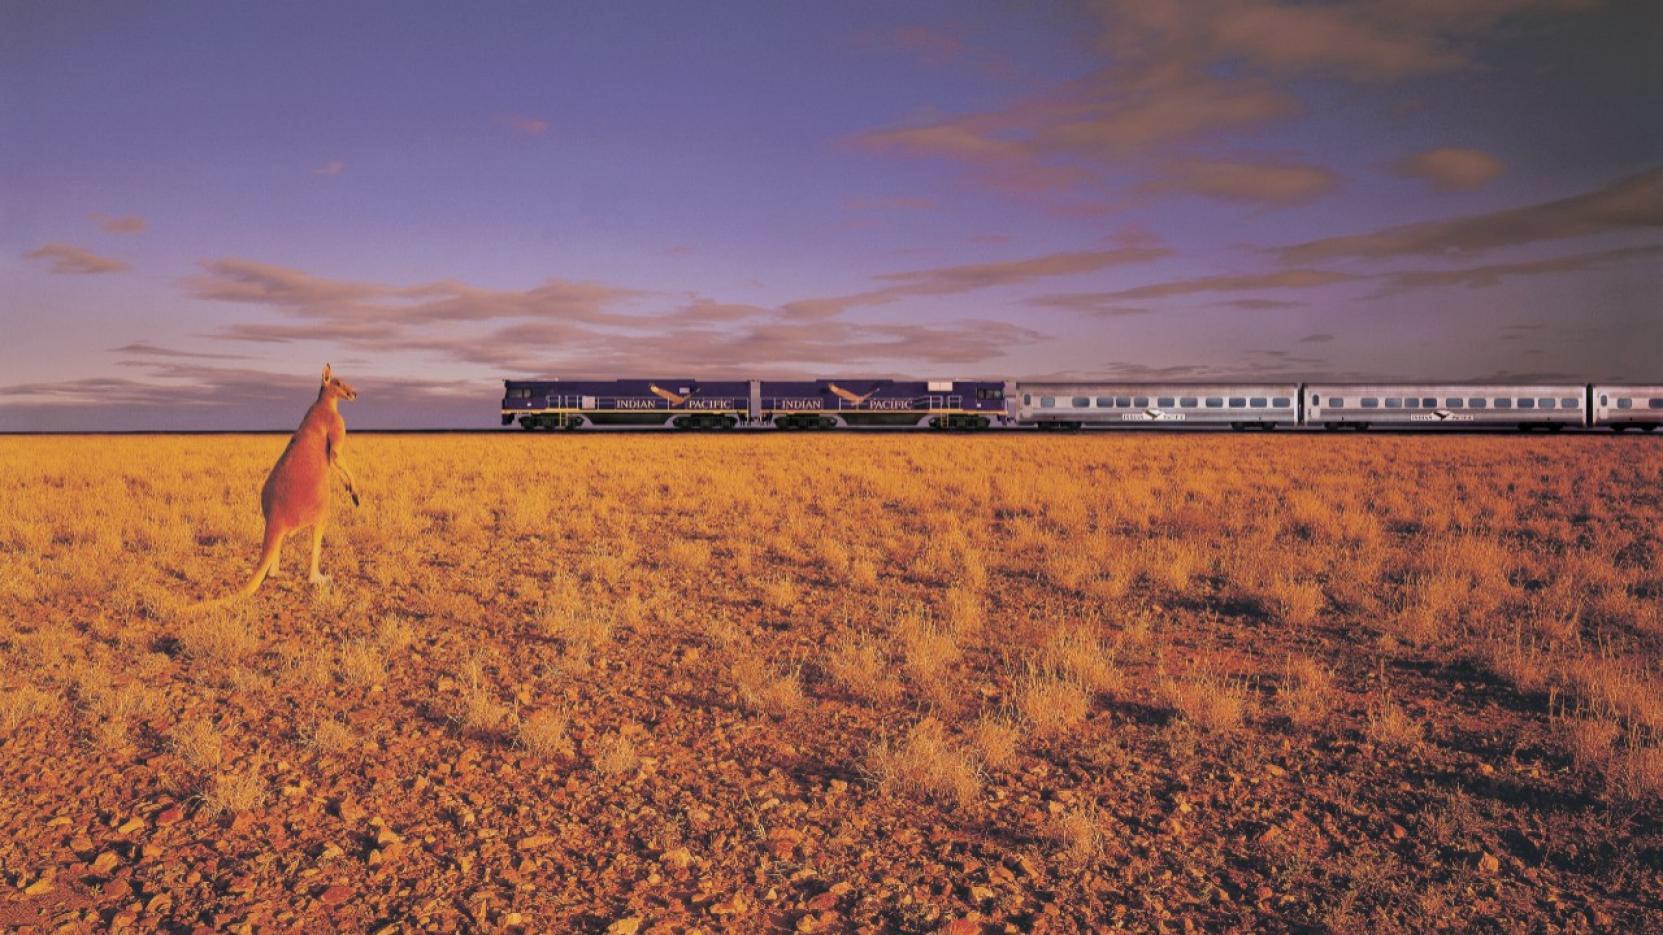 Kangaroo watching a train go past in the distance, Australia